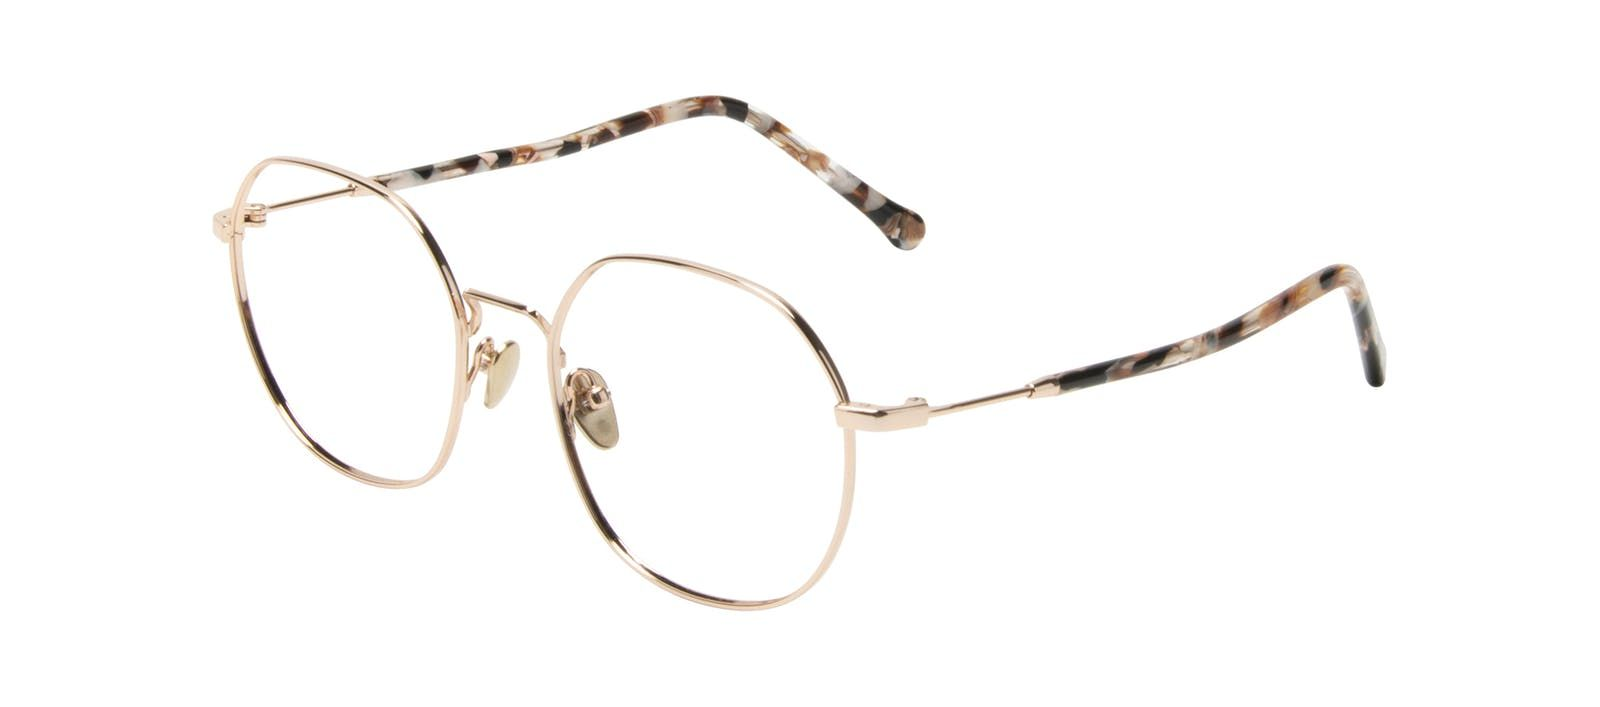 7d91b339cd10 Affordable Fashion Glasses Round Eyeglasses Women Coco Gold Tilt